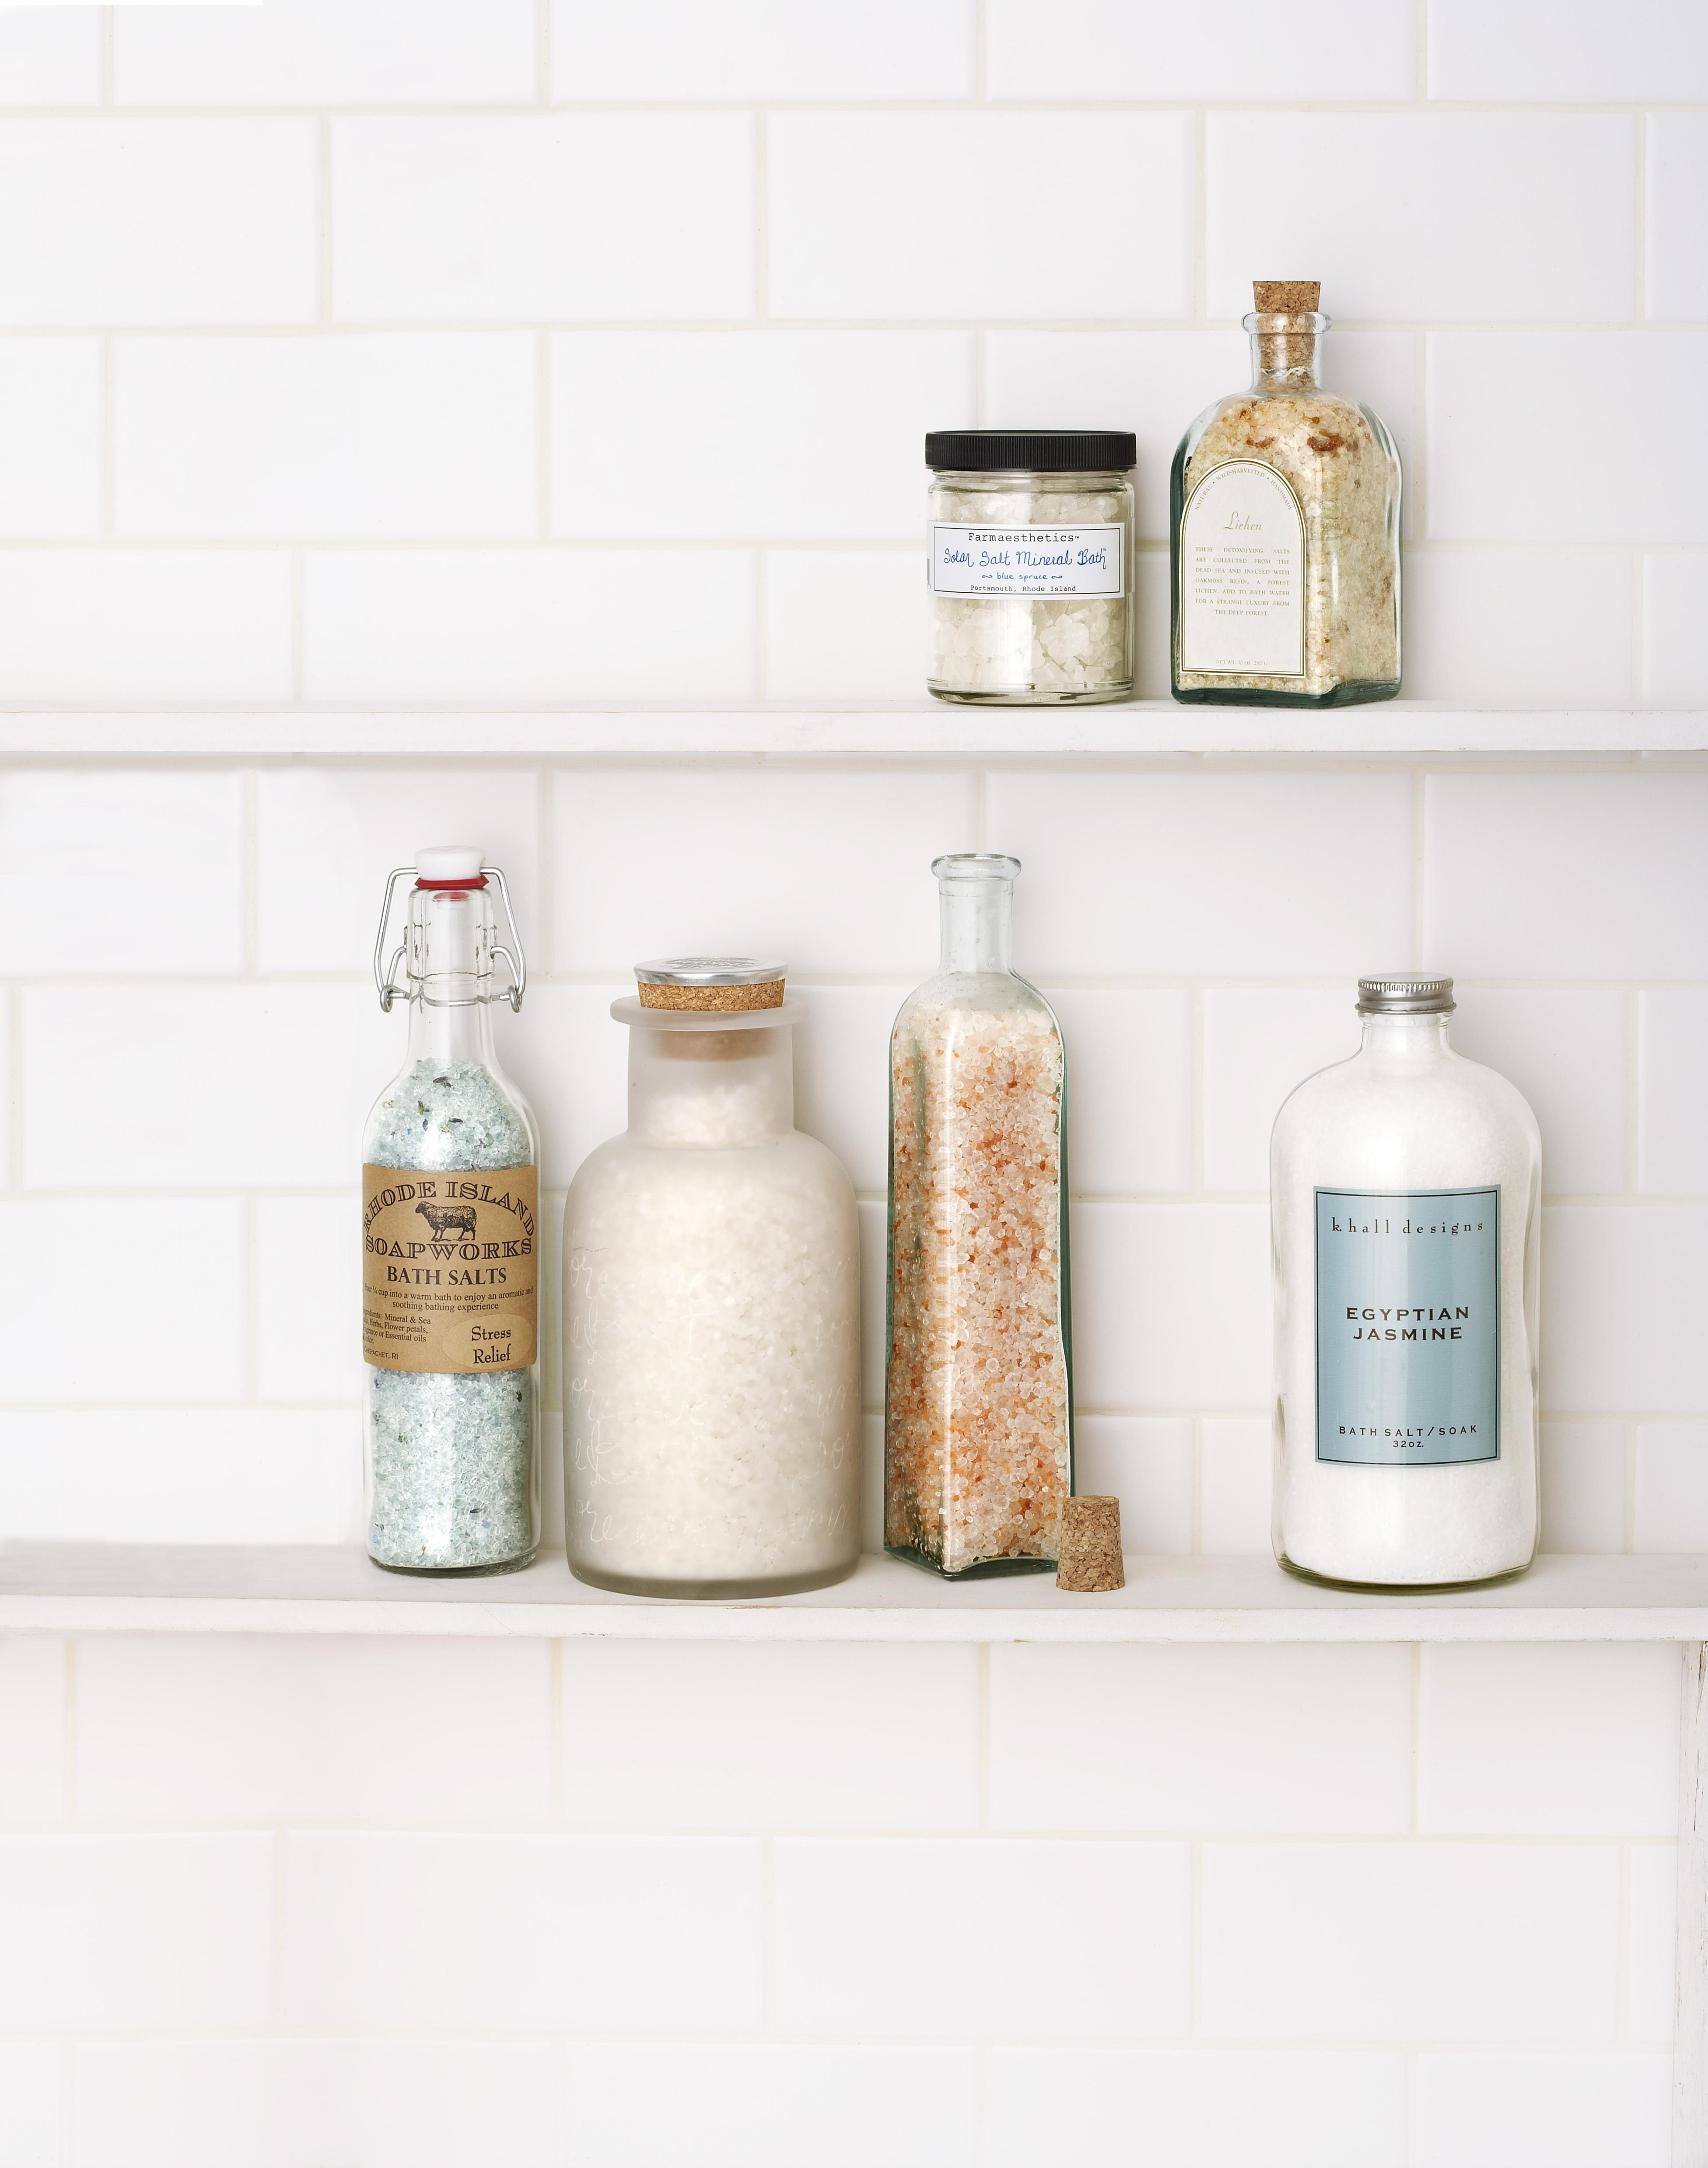 10 Bathroom Decorating Ideas - Pictures of Bathroom Decor and Designs